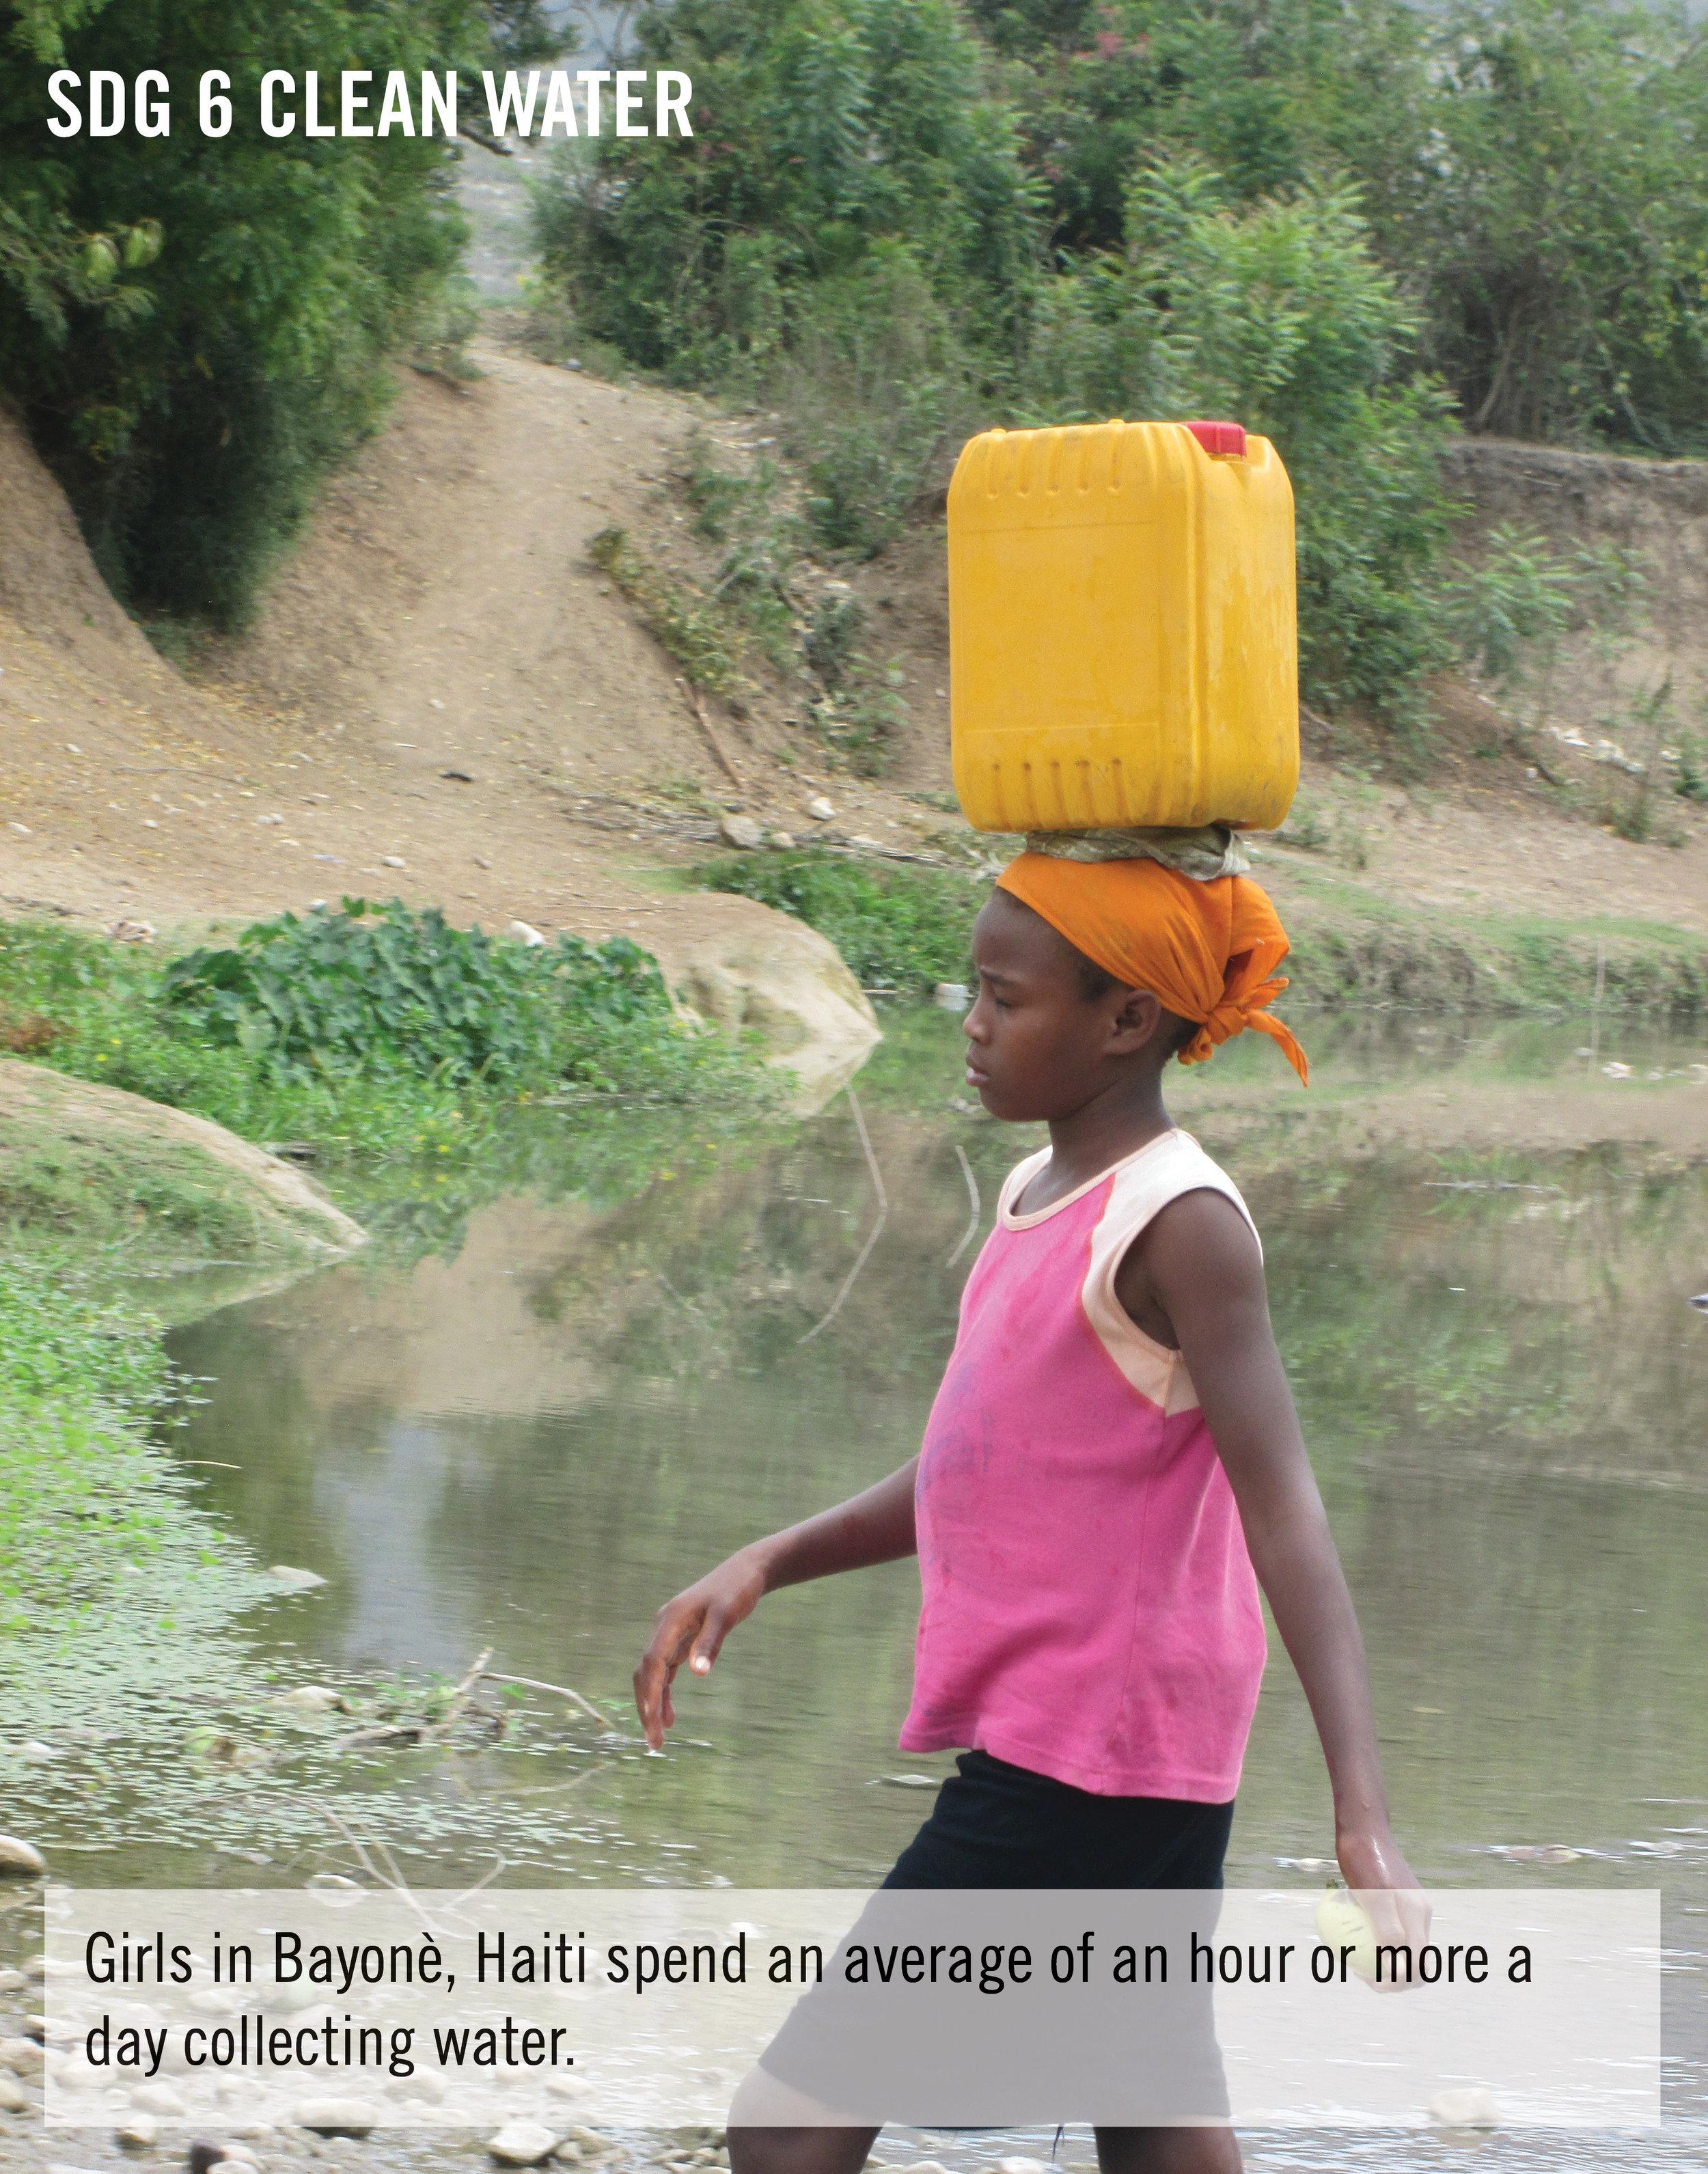 Photo by Tamara, age 14, Bayoné, Haiti